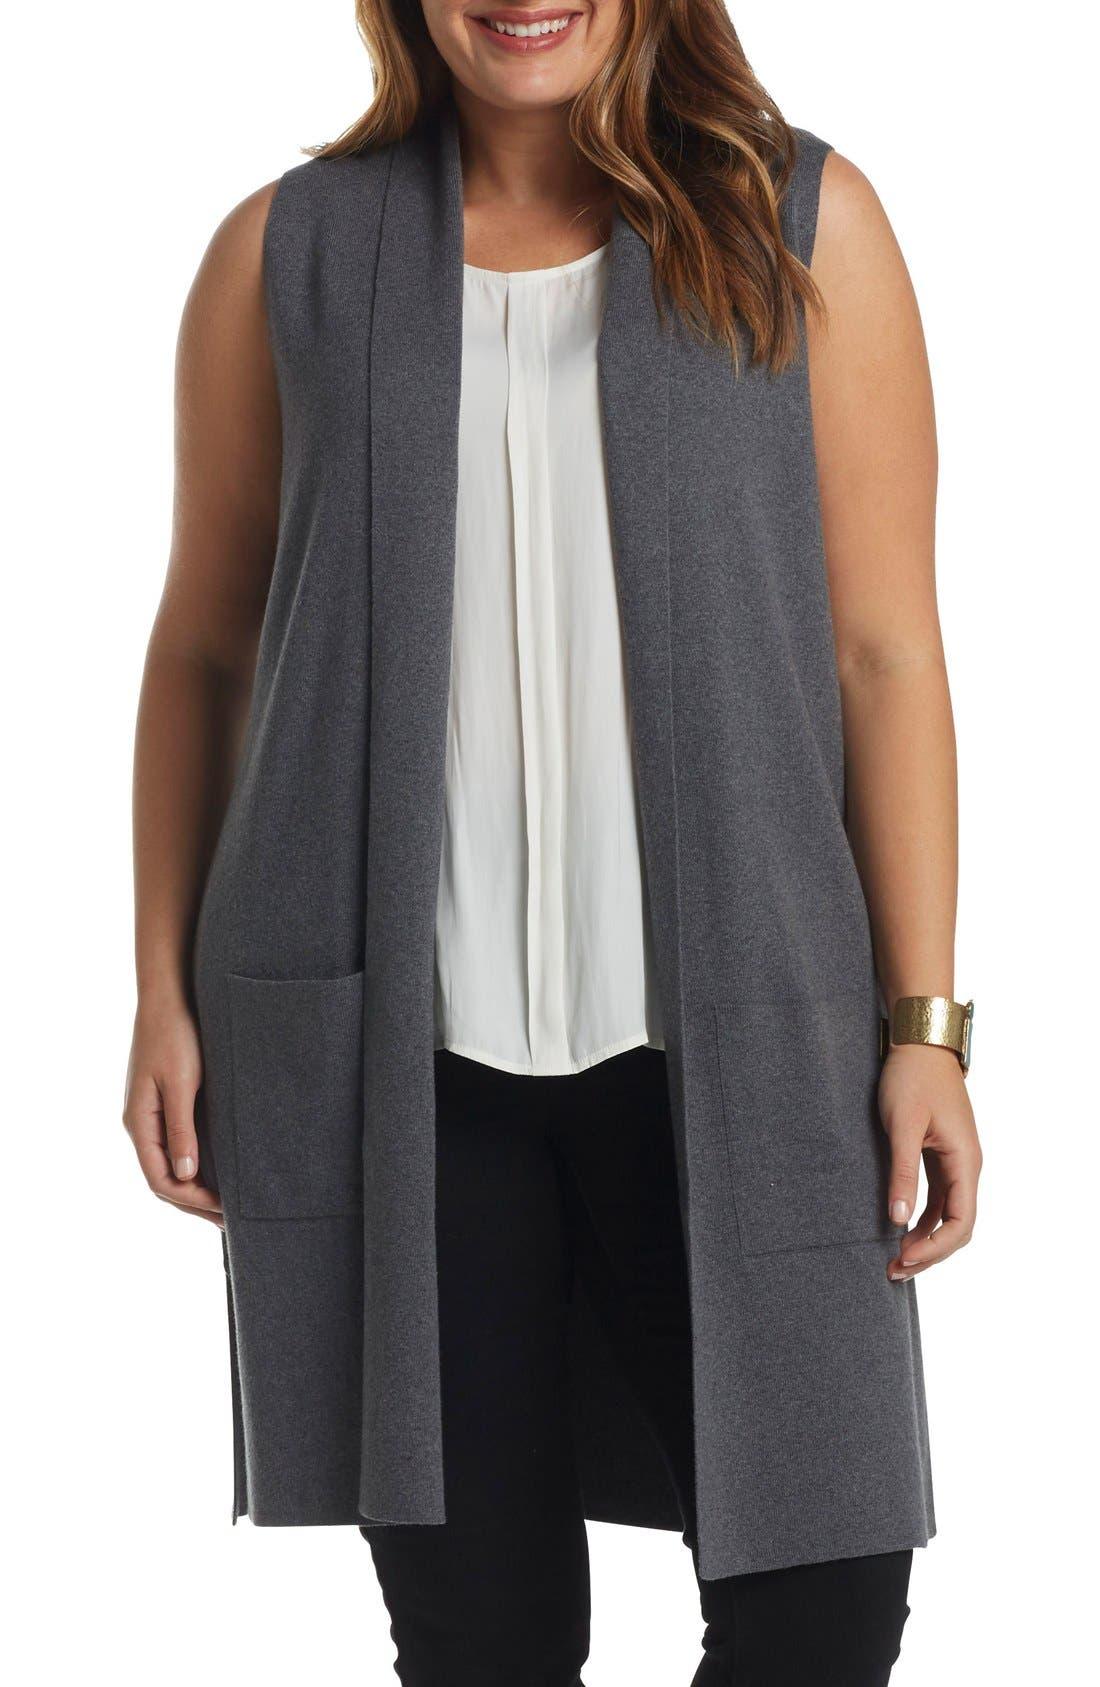 Alternate Image 1 Selected - Tart Melva Cotton & Cashmere Open Front Sweater Vest (Plus Size)